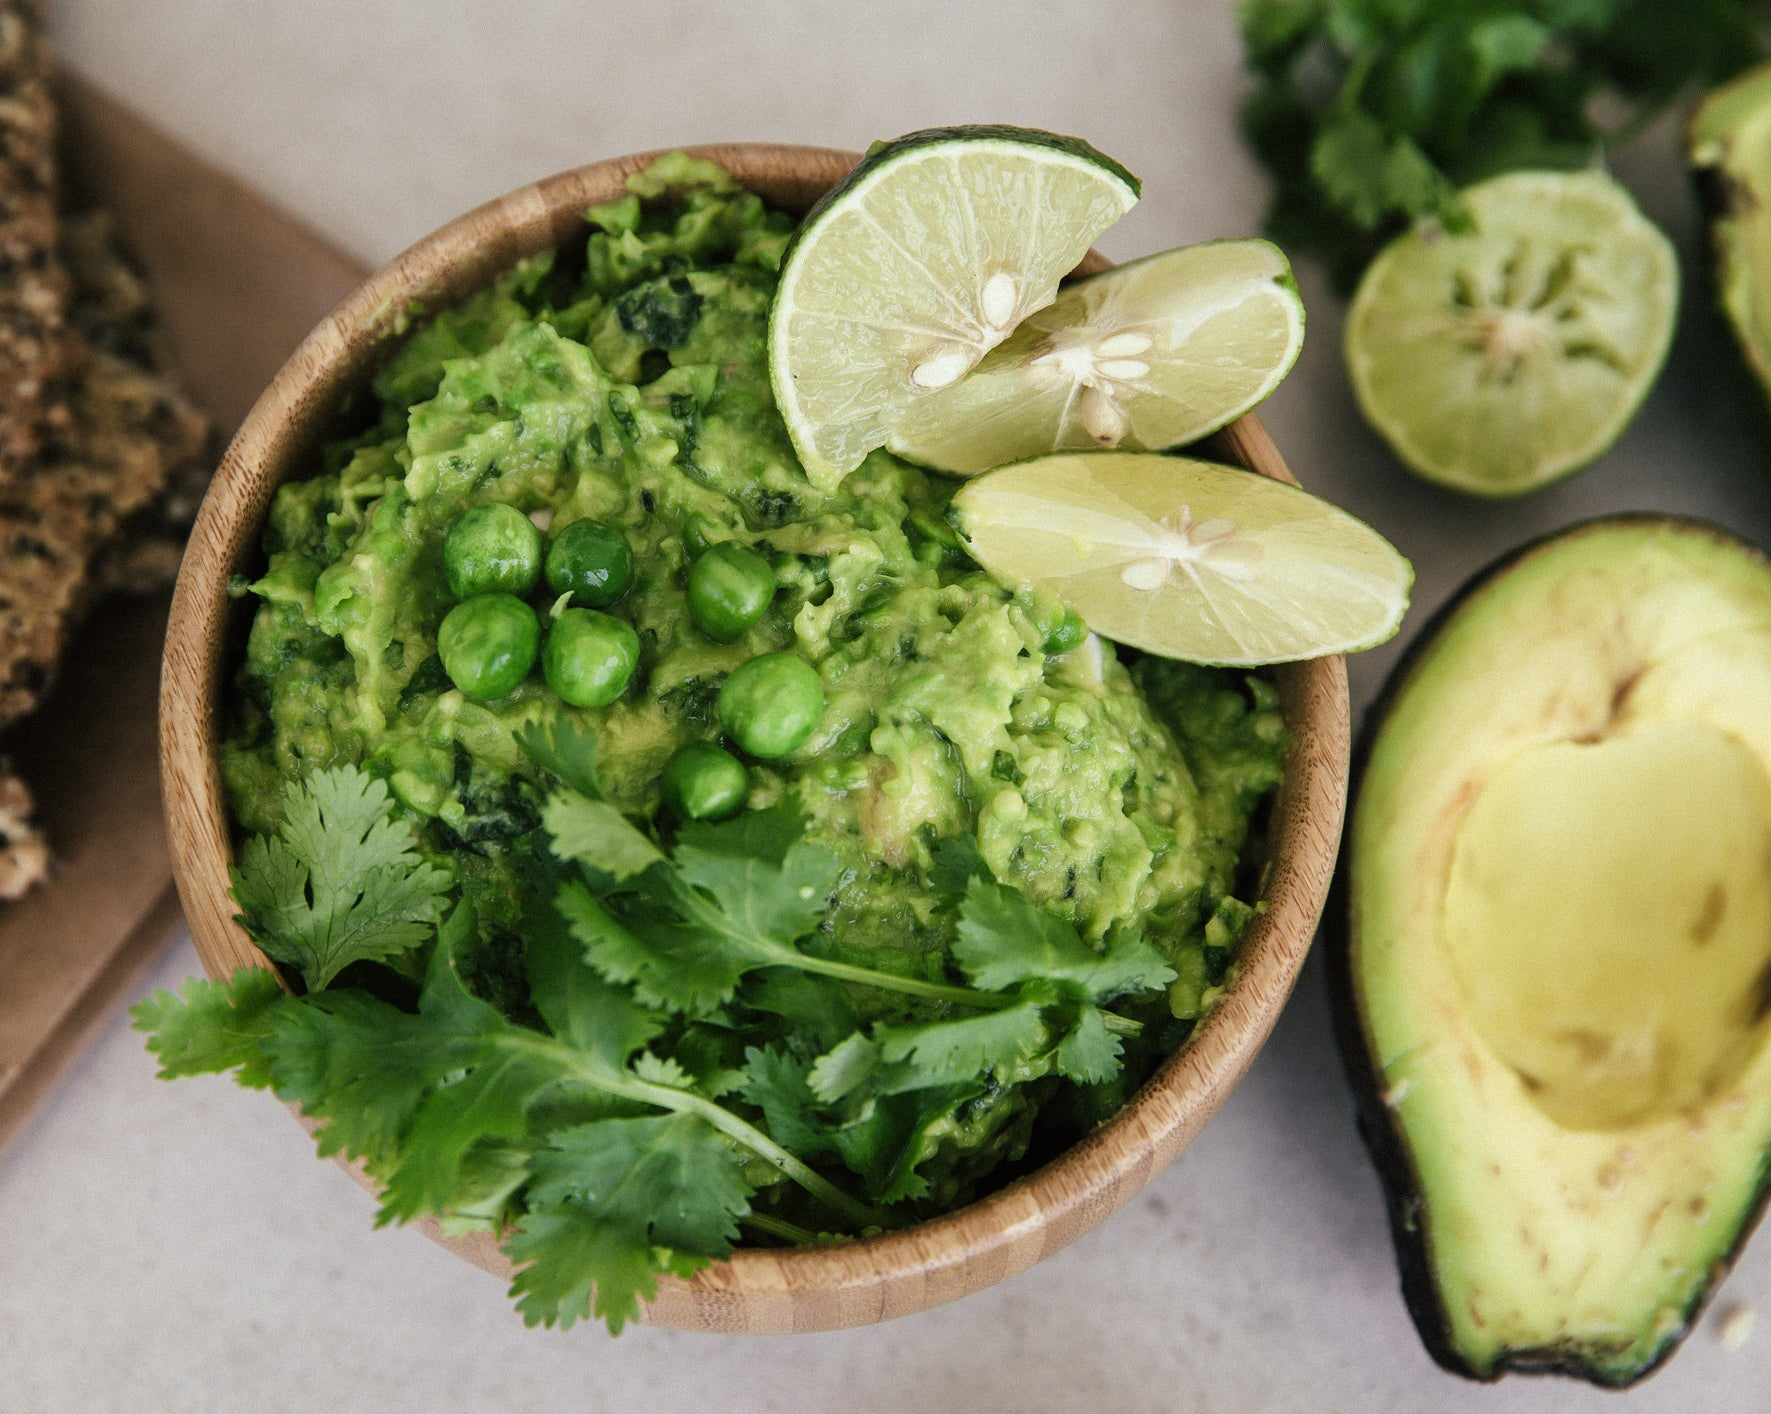 A bowl of guacamole with cilantro.